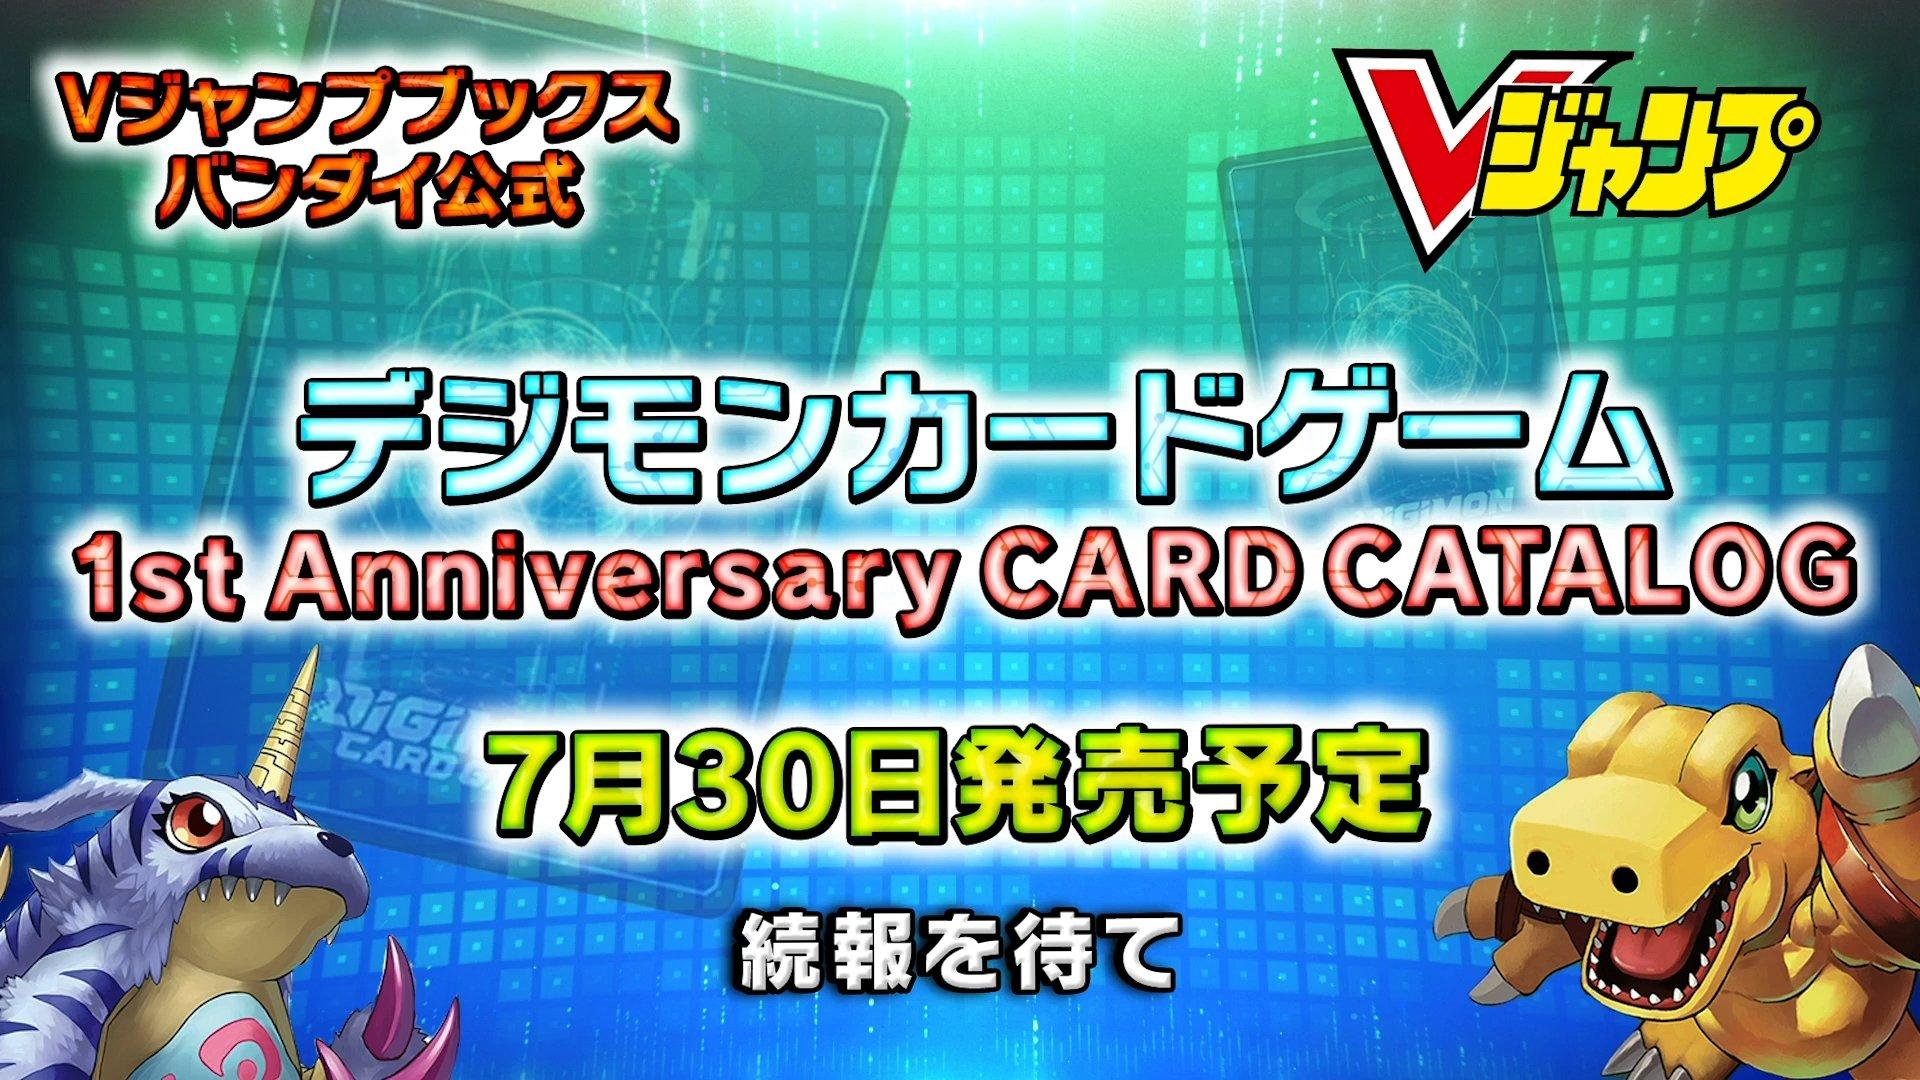 digimoncardbattle_v2_30_06_may20_2021.jpg